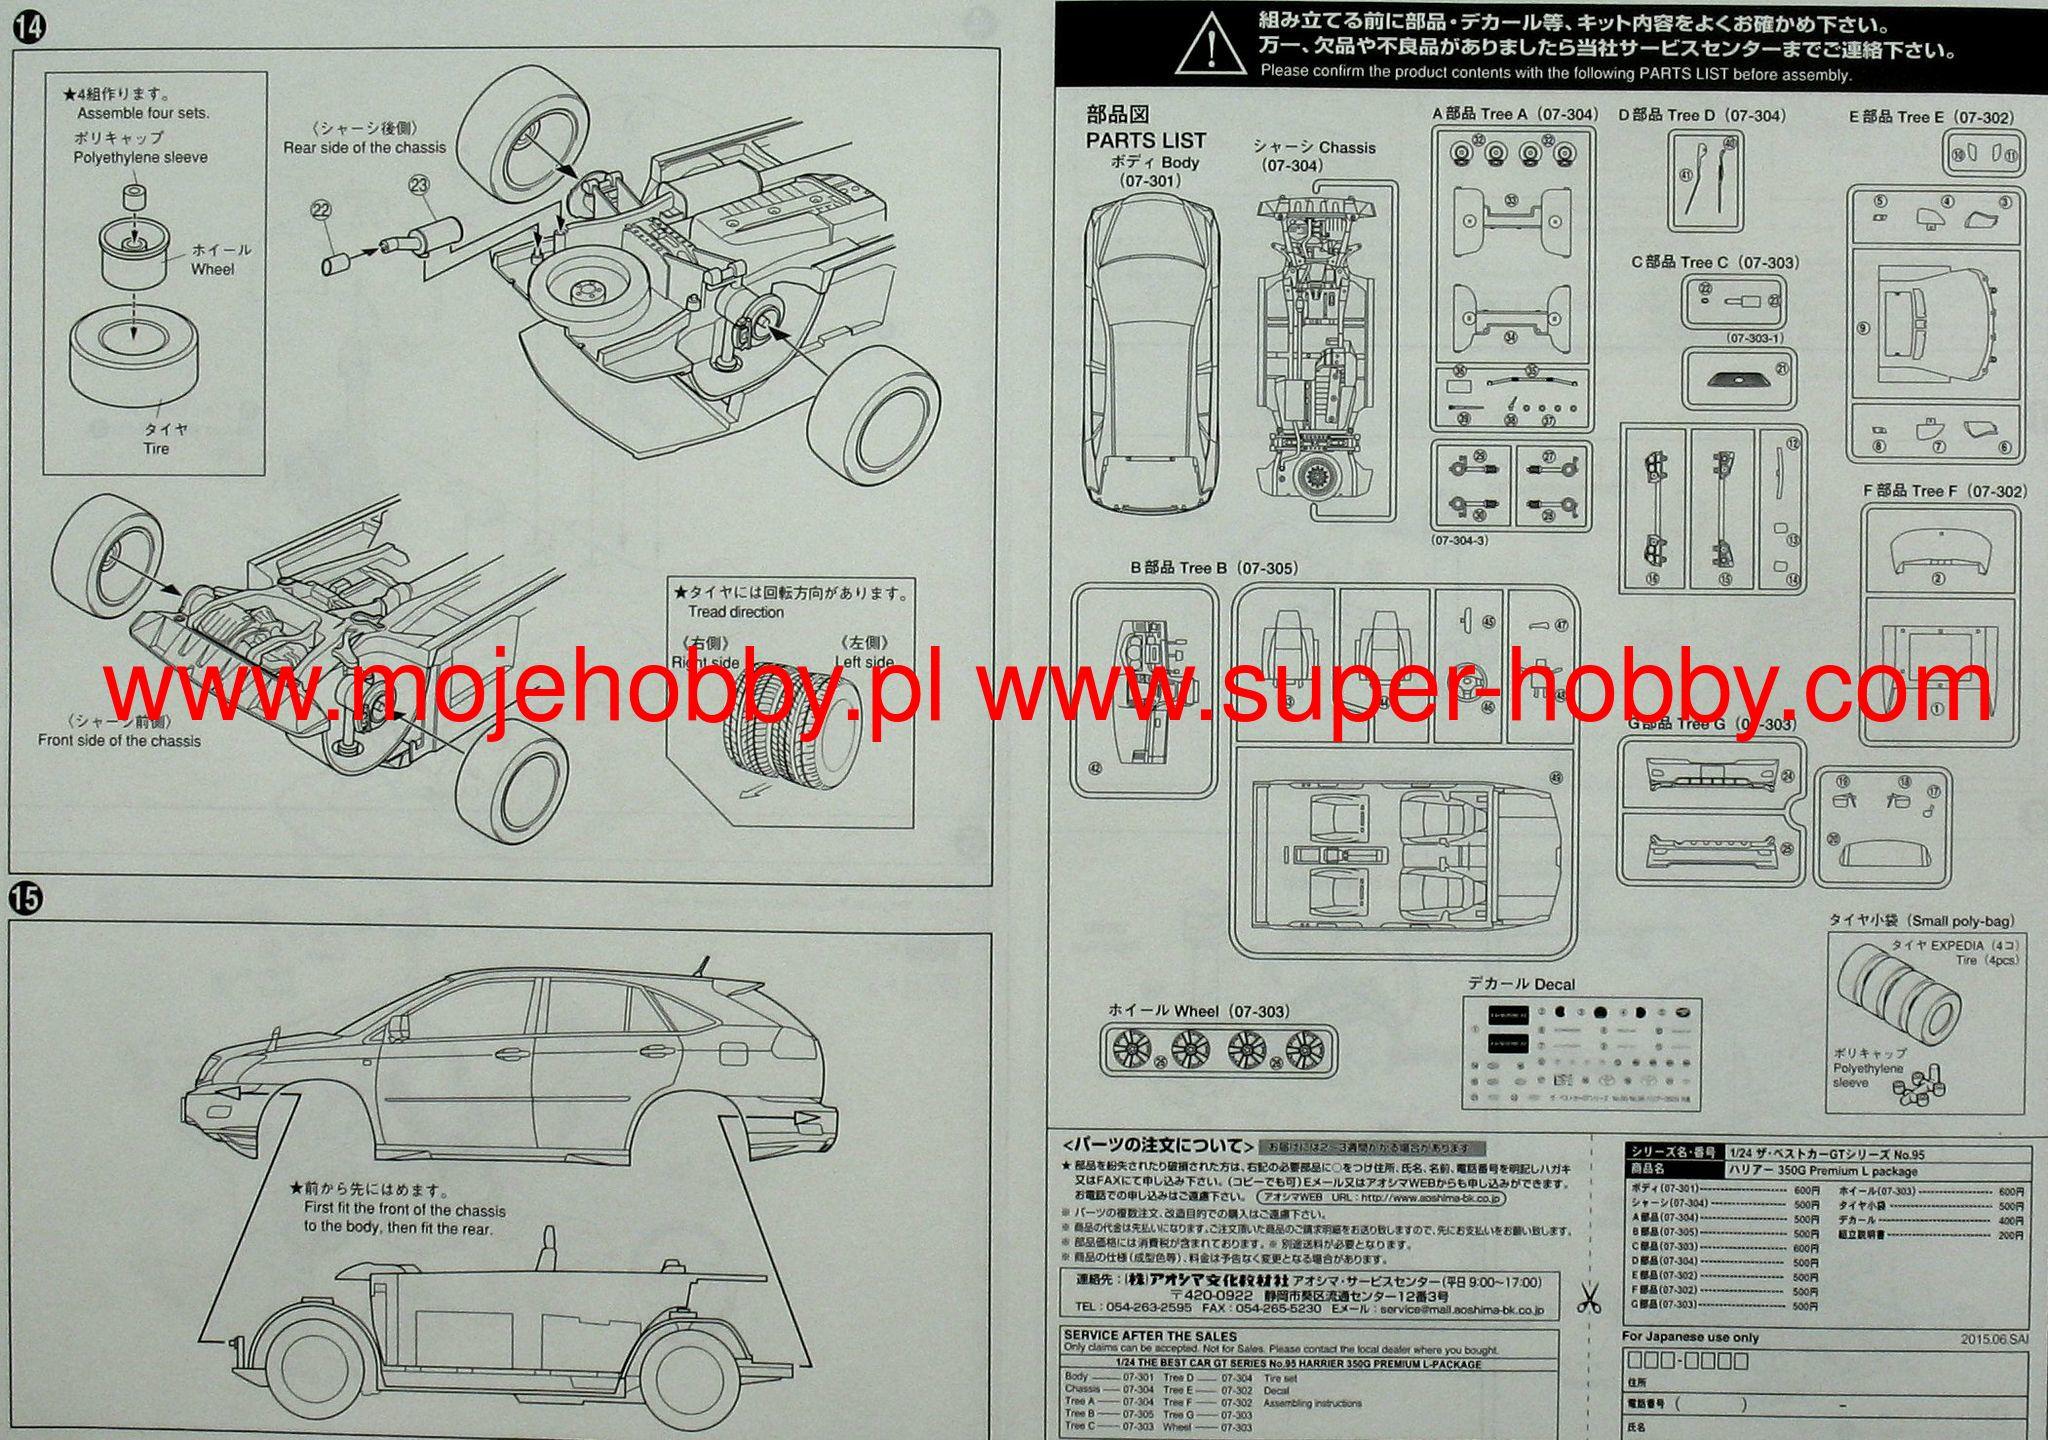 Toyota Harrier 350g Premium L Package Aoshima 03953 Engine Diagram 2 Aos03953 4 5